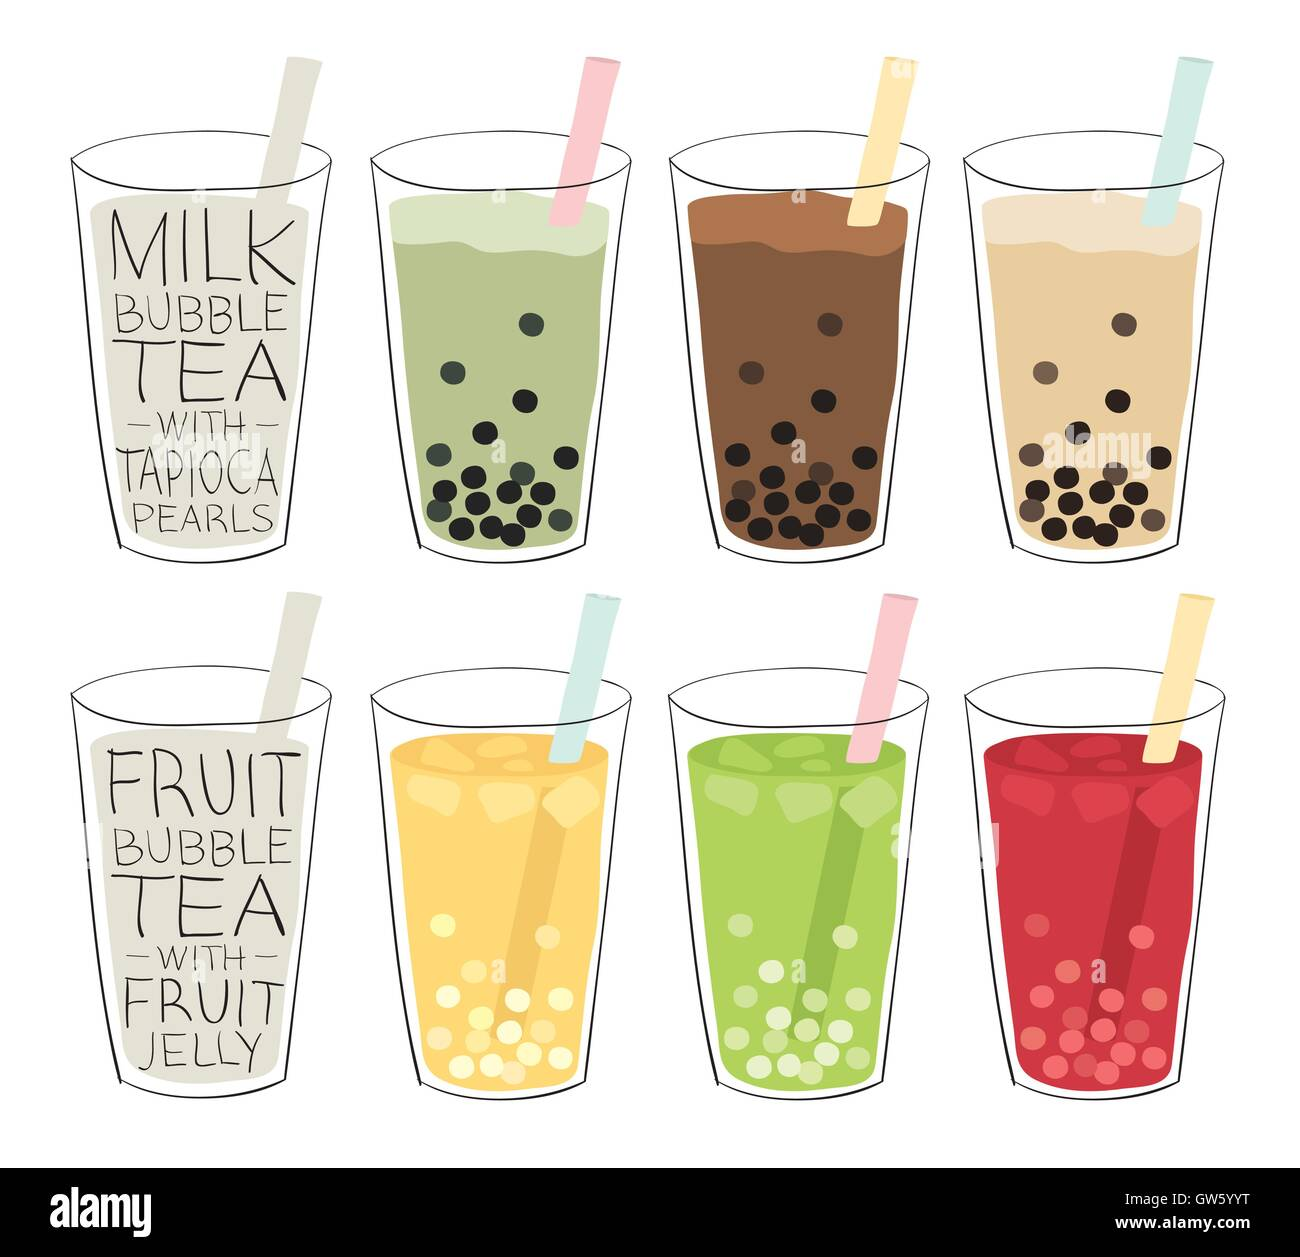 Tapioca pearls bubble tea recipe Taiwanese Bubble